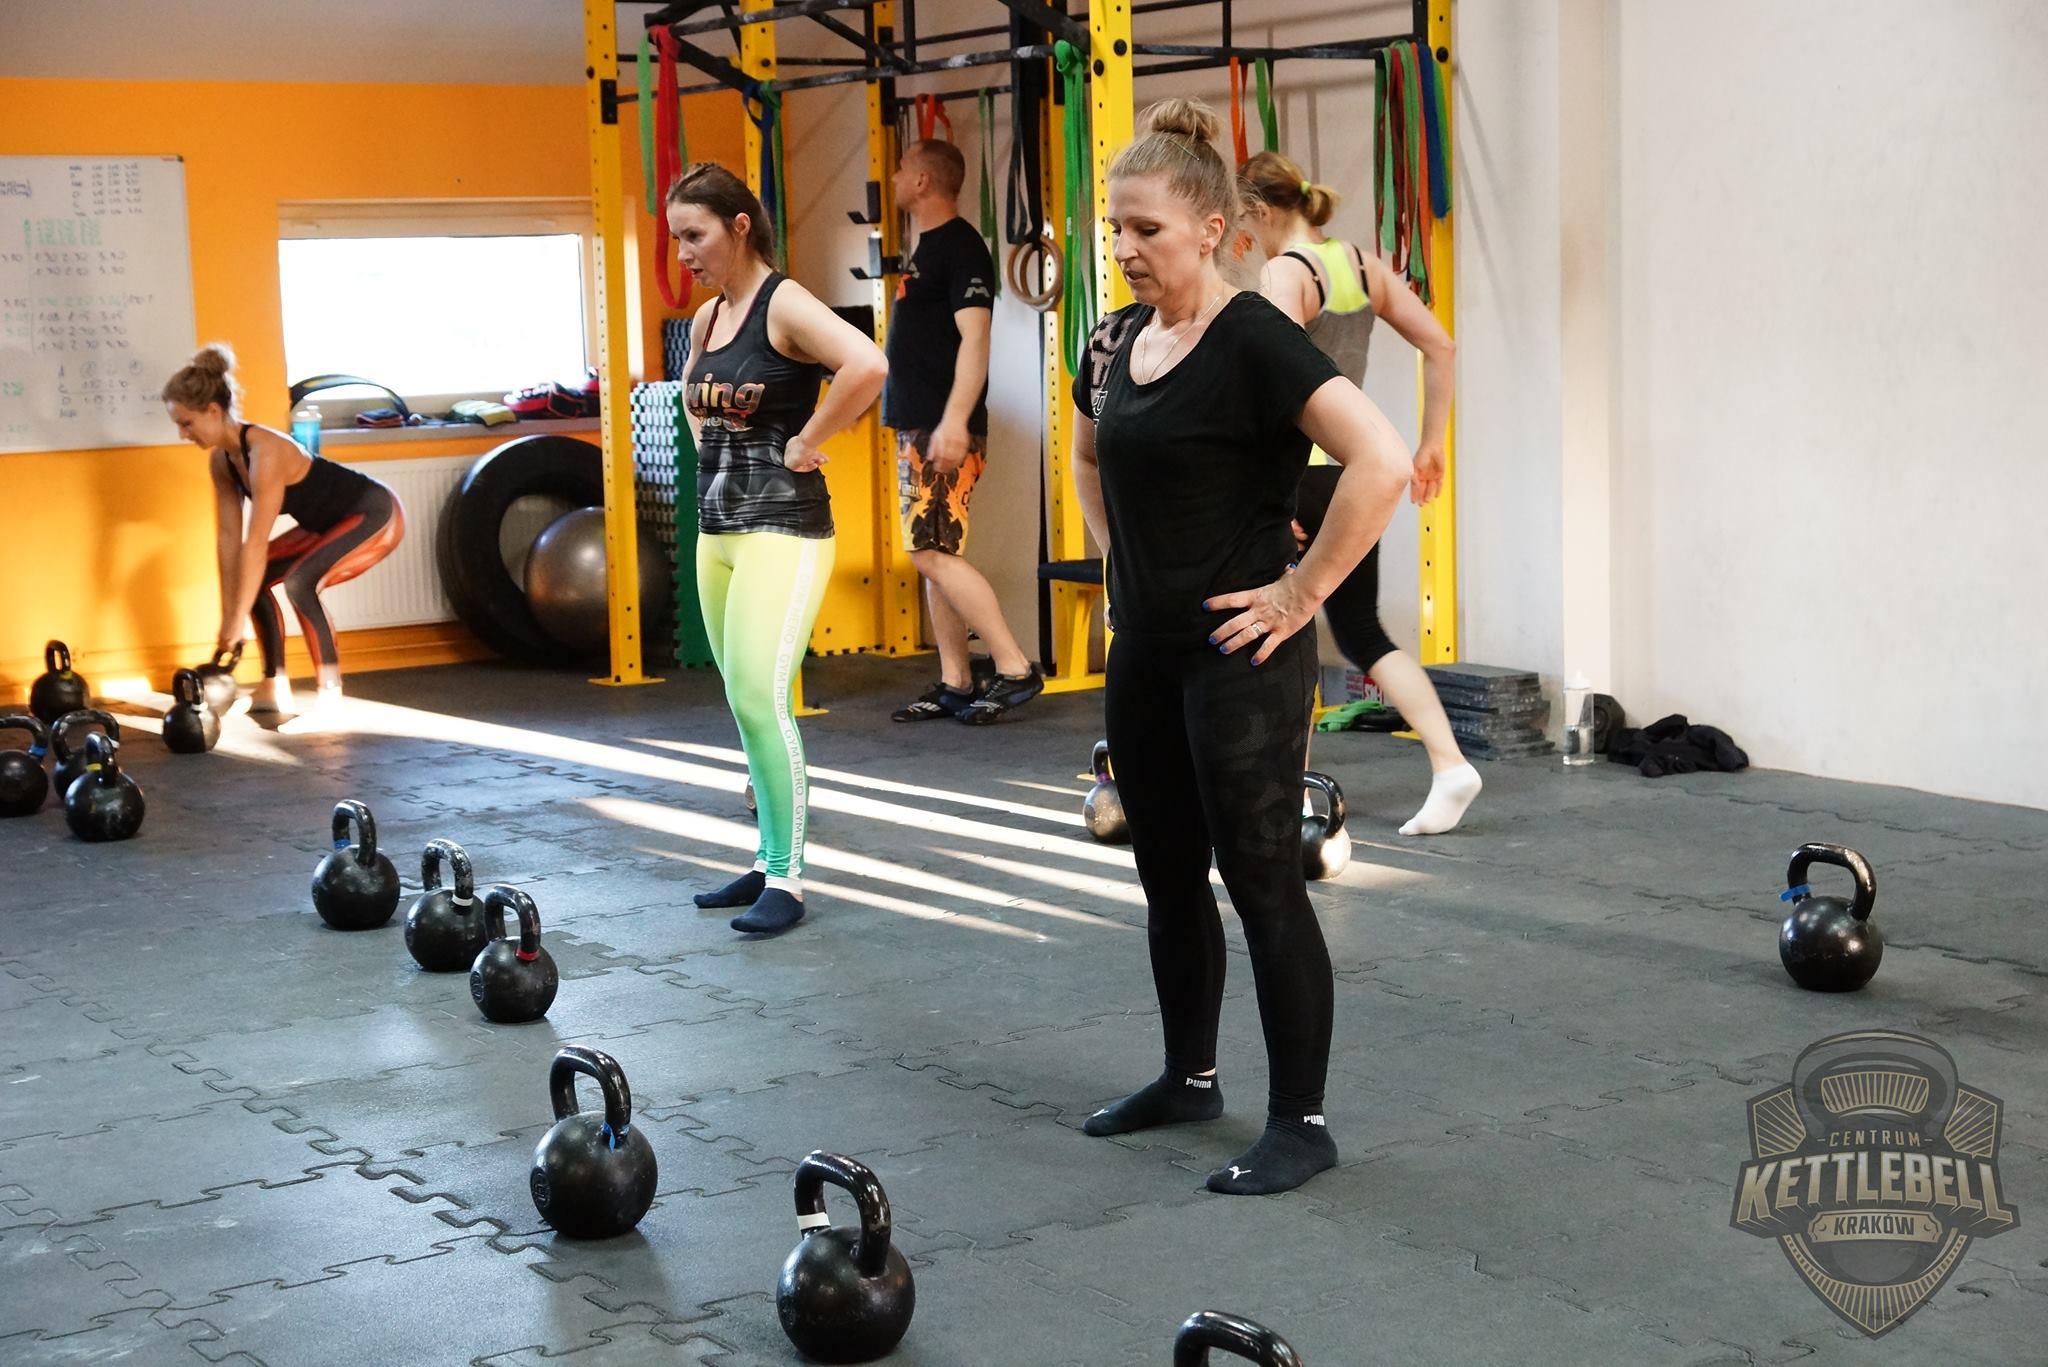 centrum_kettlebell_kraków_trening_siłowy